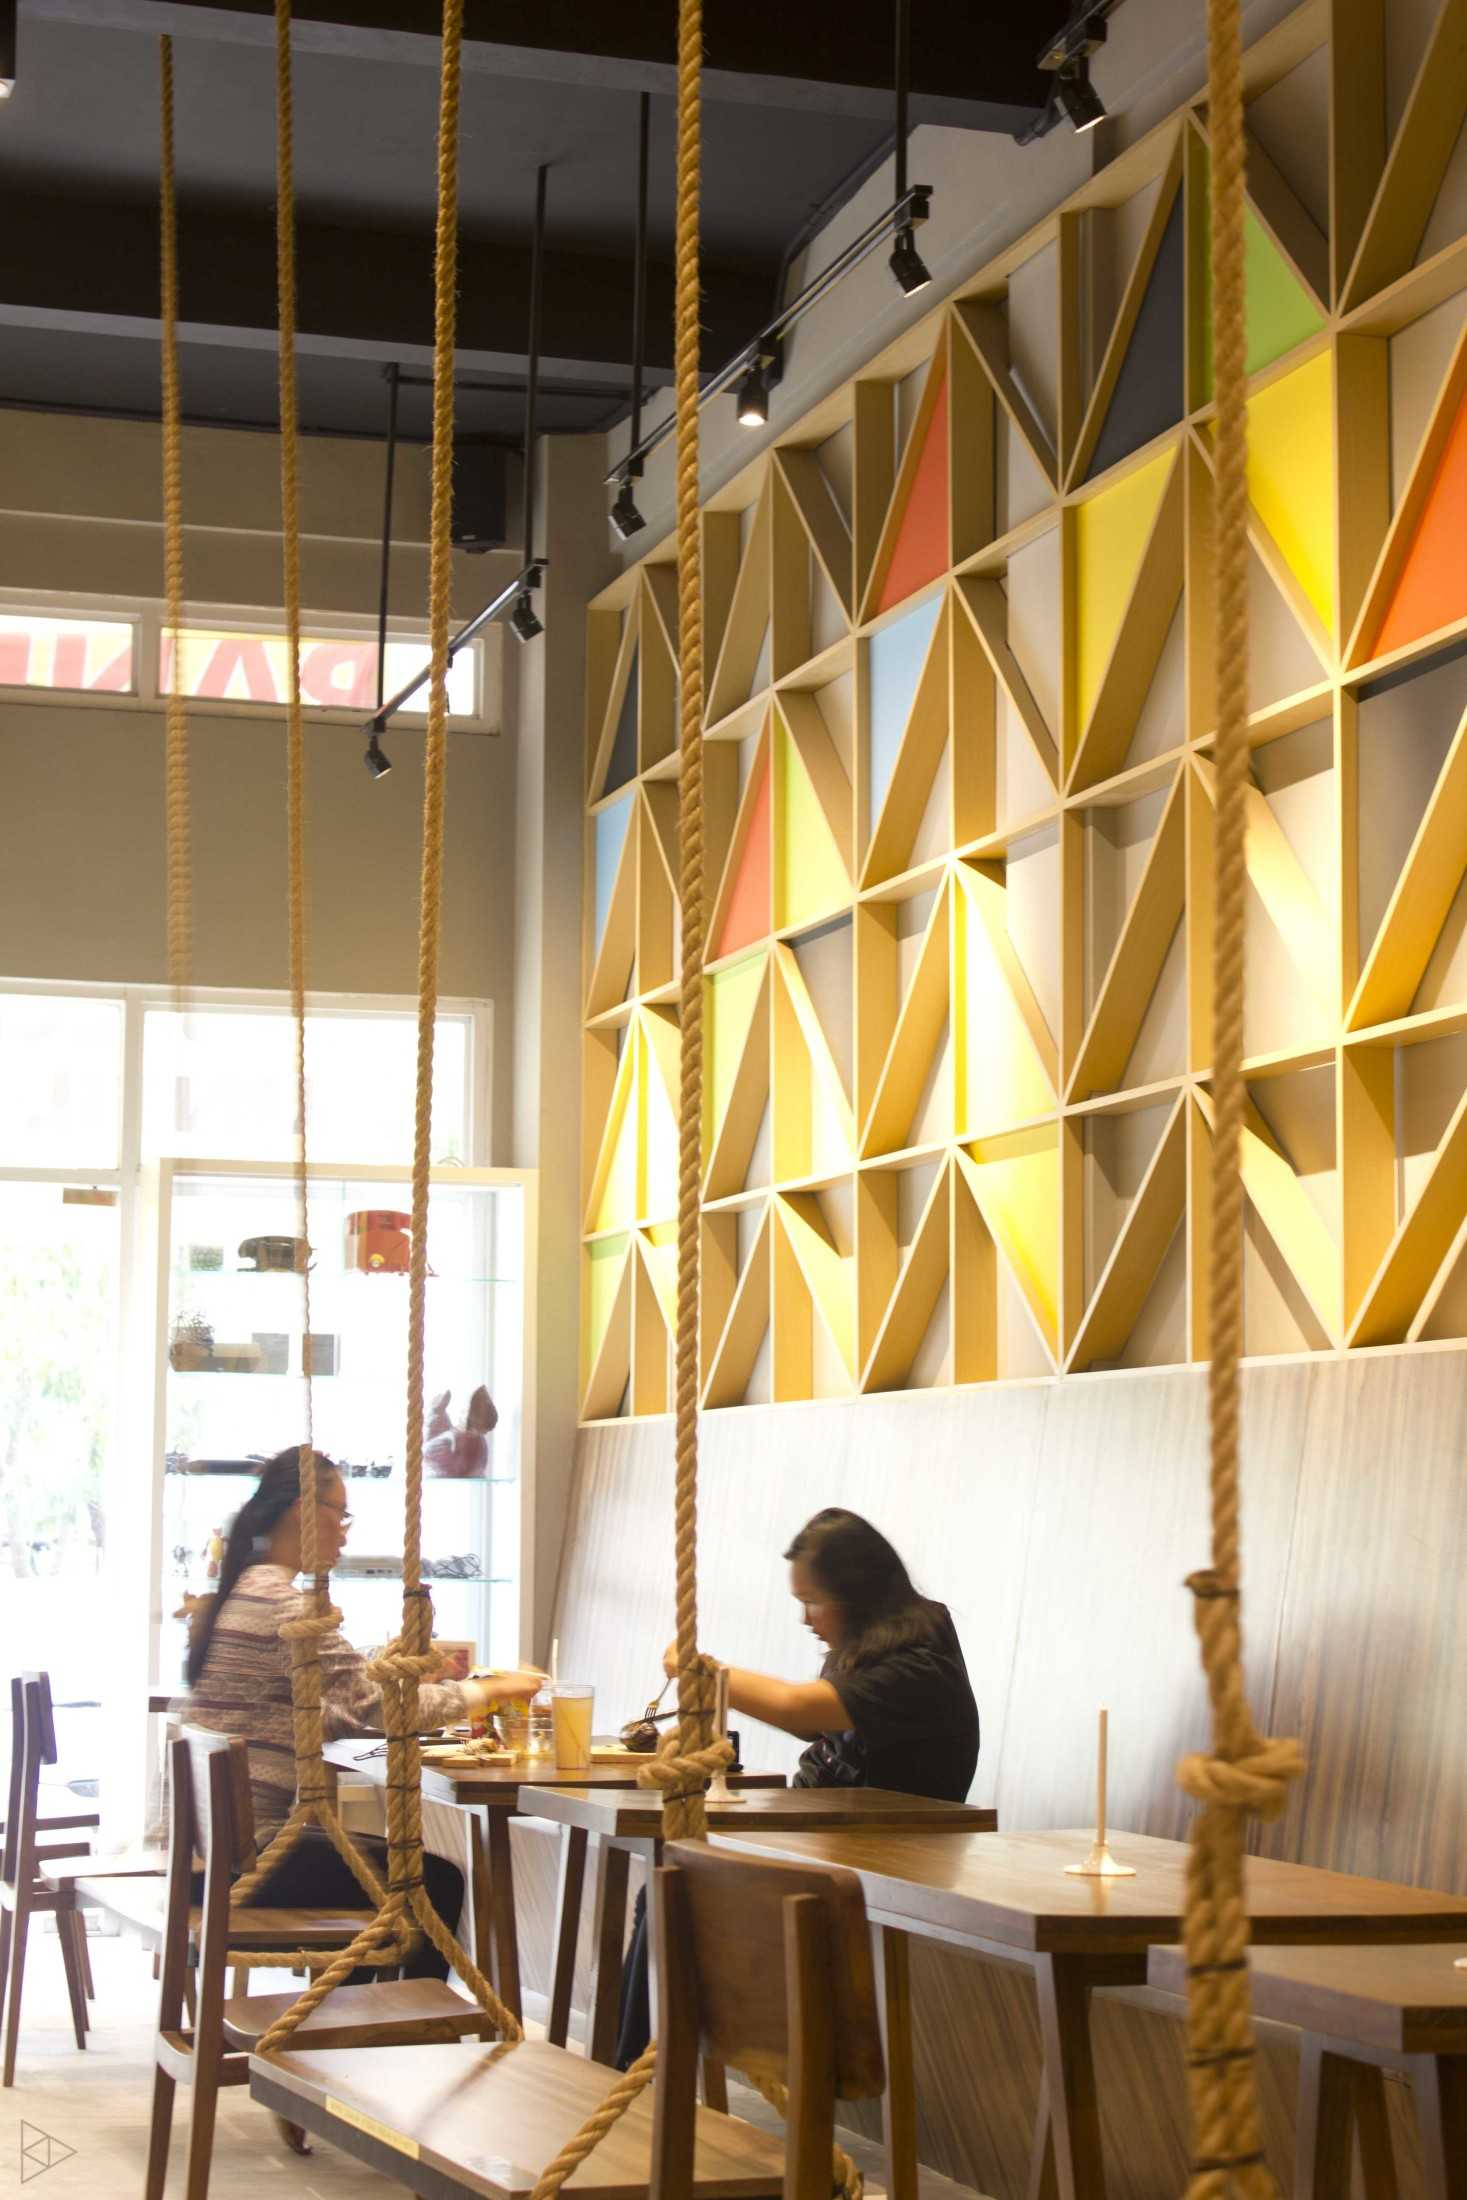 Ties Design & Build 90'S Flazback Cafe Klp. Indah, Kec. Tangerang, Kota Tangerang, Banten, Indonesia Klp. Indah, Kec. Tangerang, Kota Tangerang, Banten, Indonesia Eating Area - 1St Floor  68652